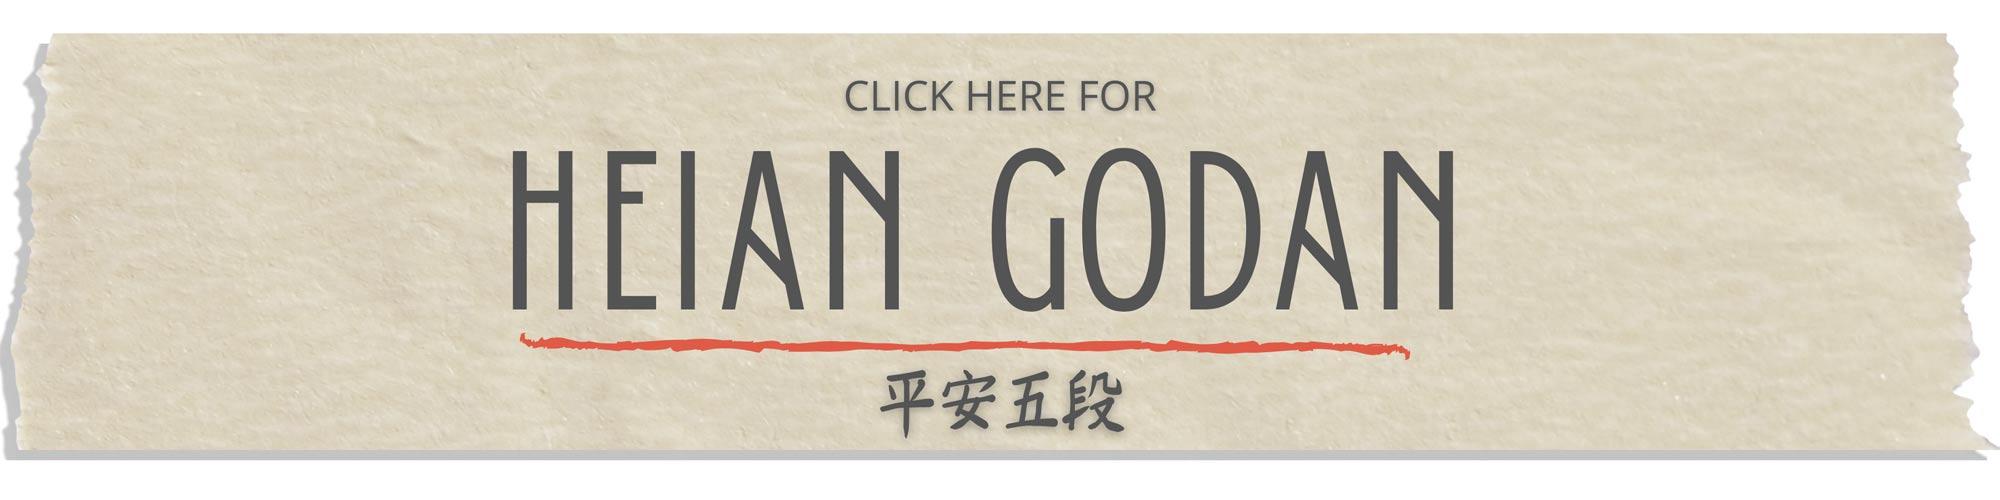 heian godan kata tutorial